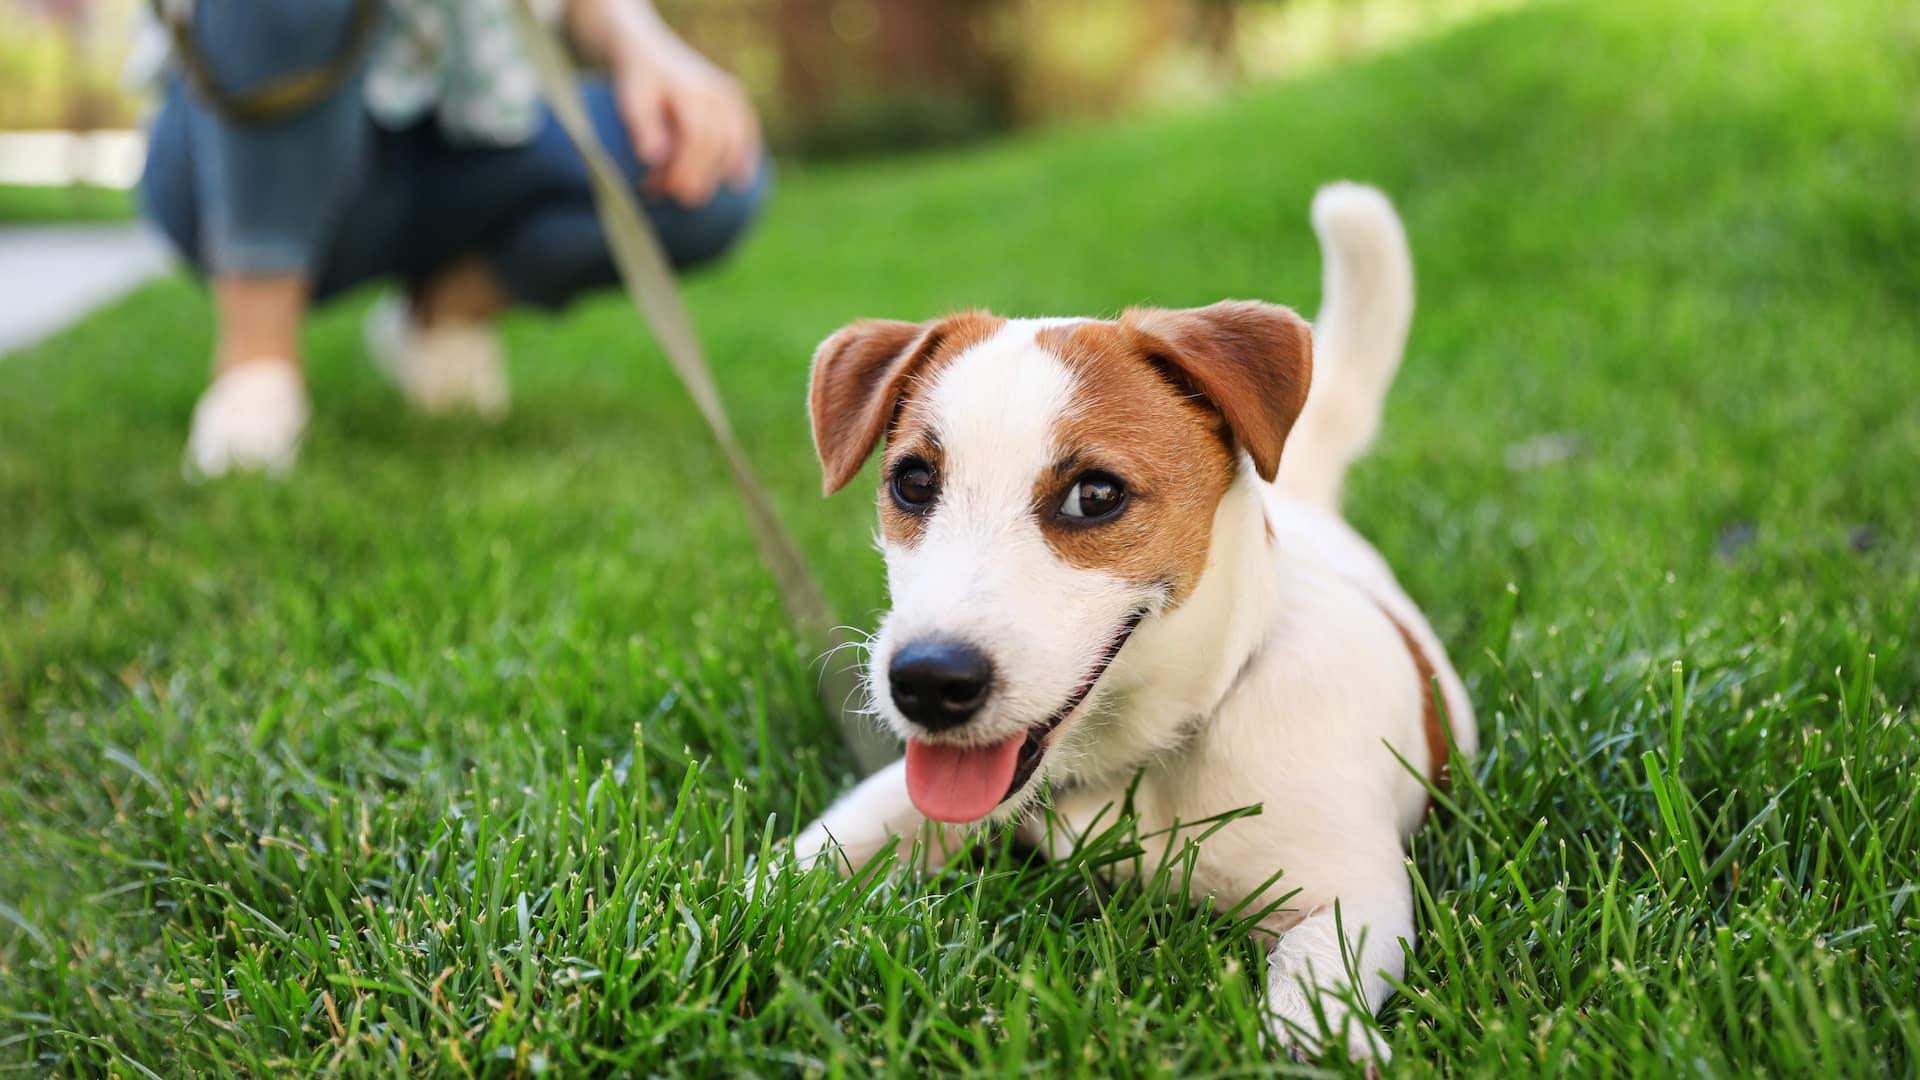 Pick Up After Your Dog Banner Image